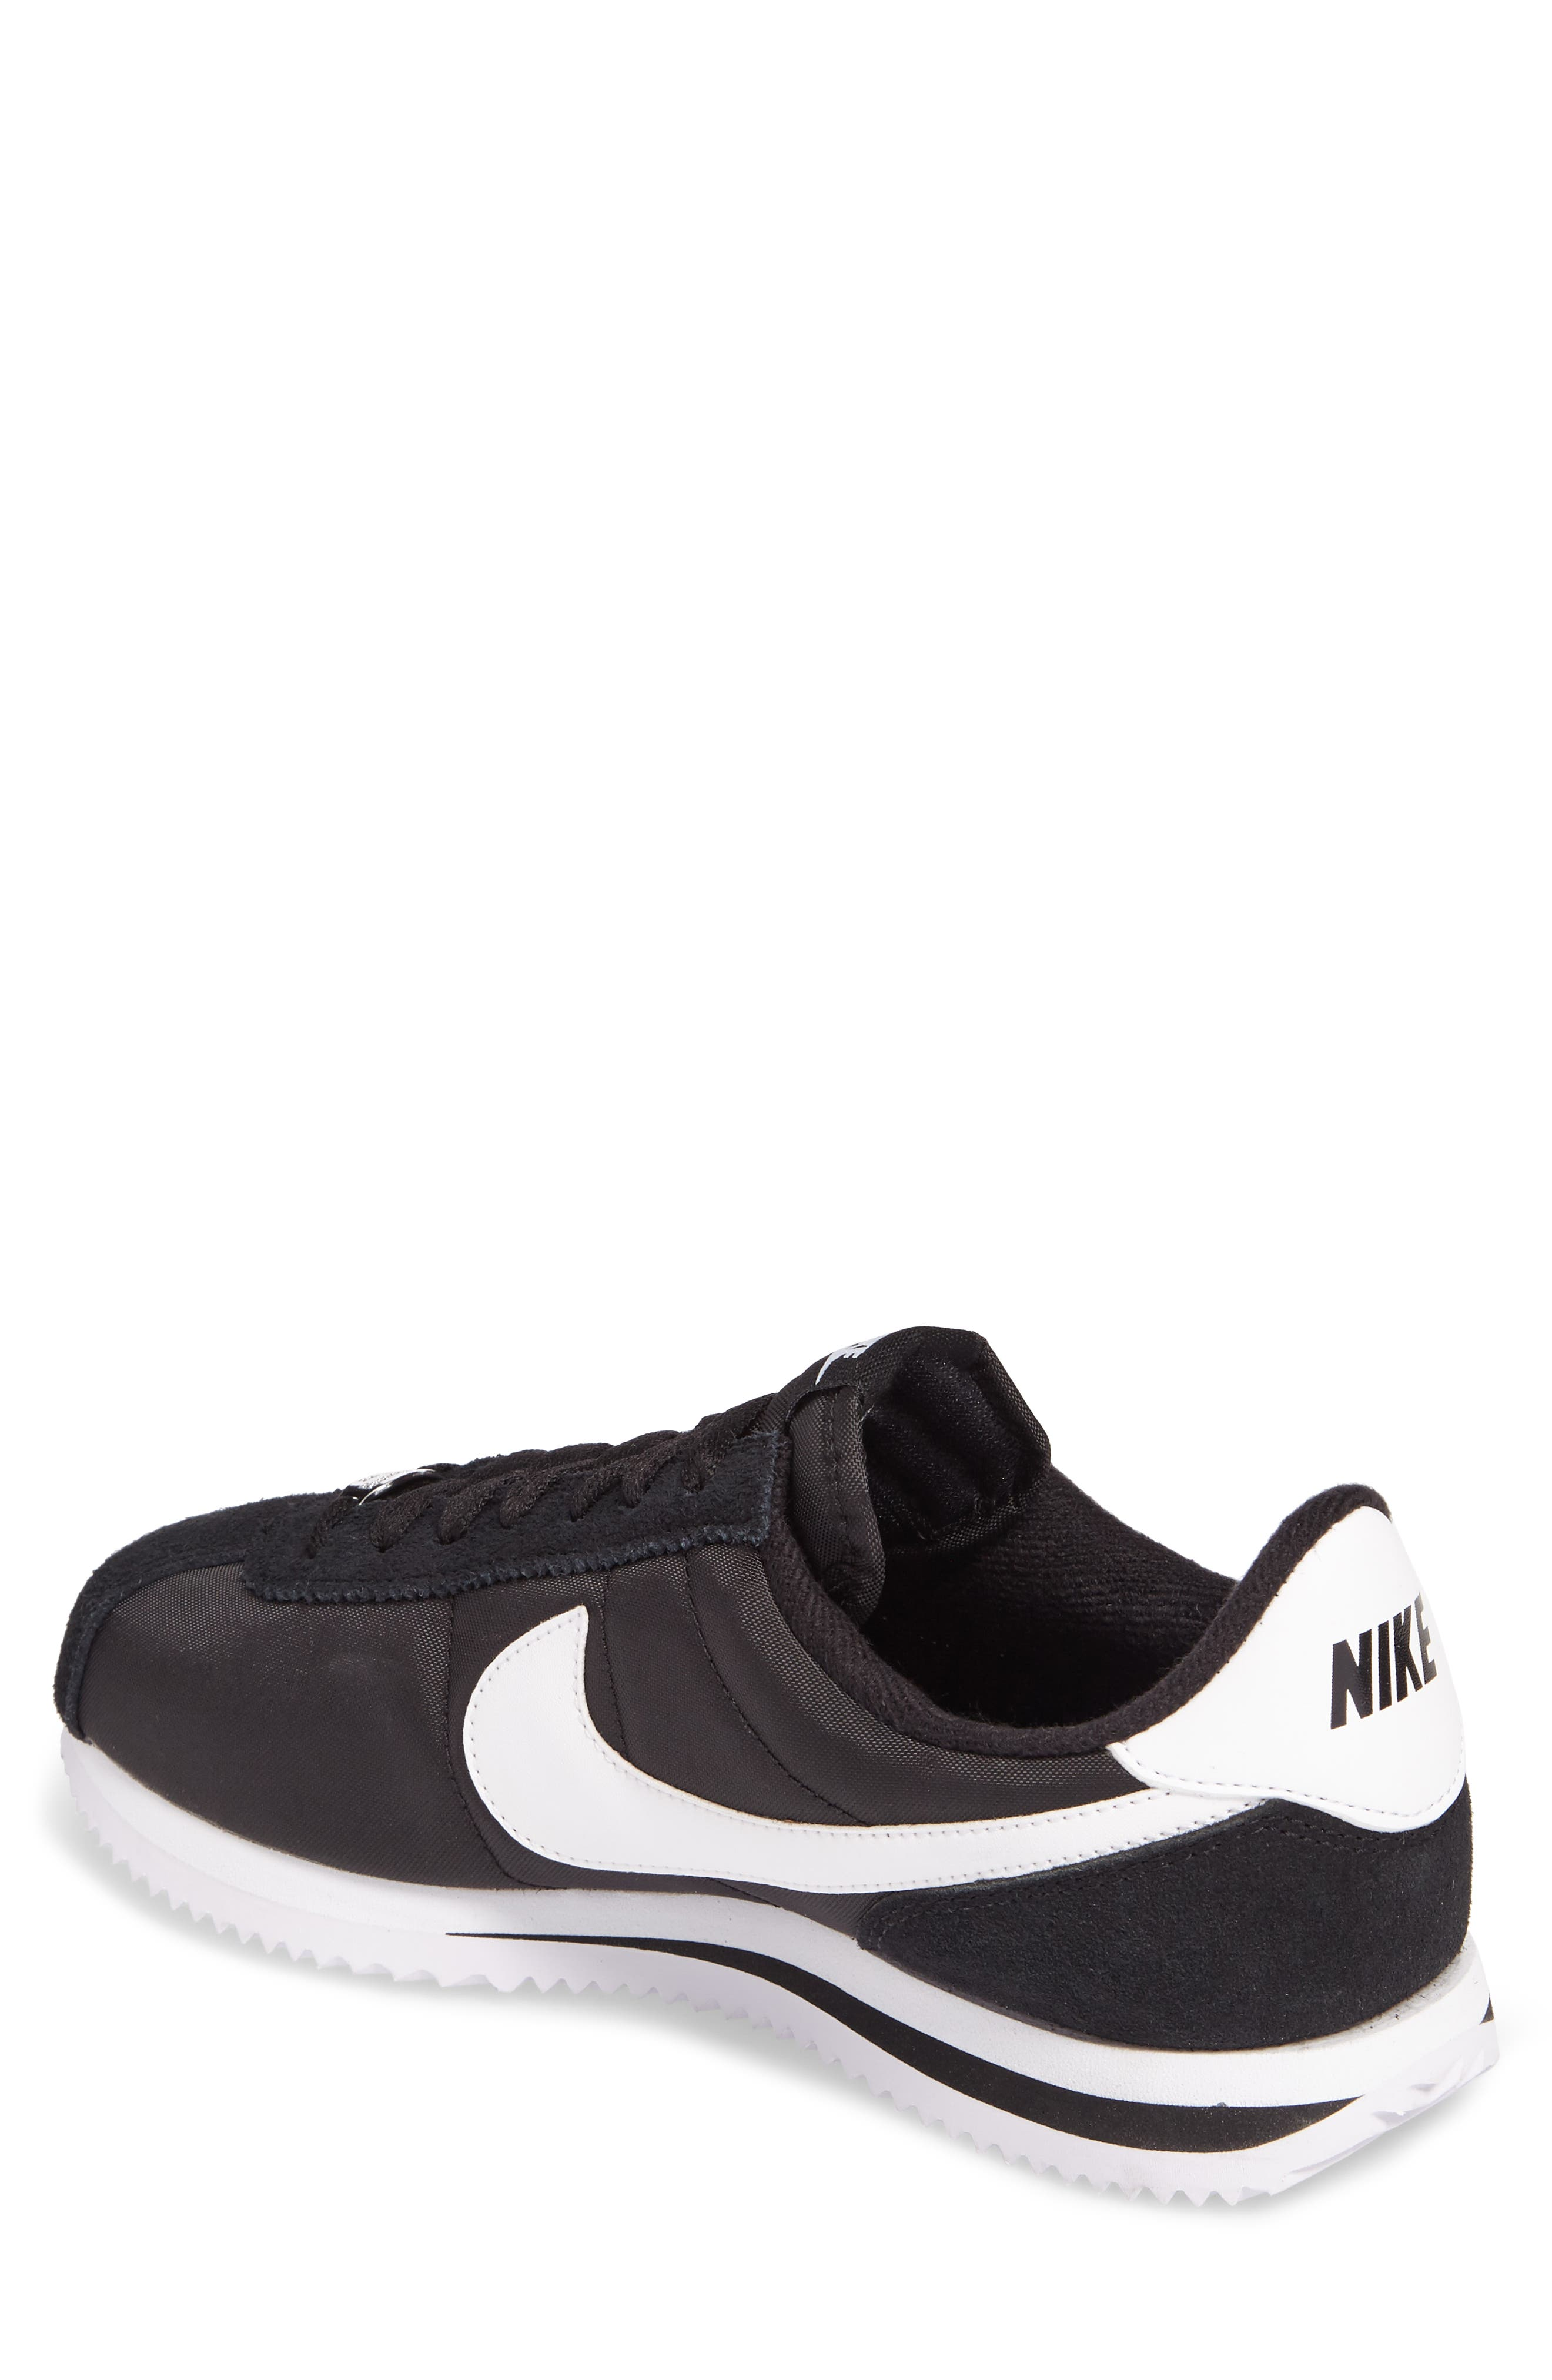 Cortez Basic Nylon Sneaker,                             Alternate thumbnail 2, color,                             BLACK/WHITE/METALLIC SILVER